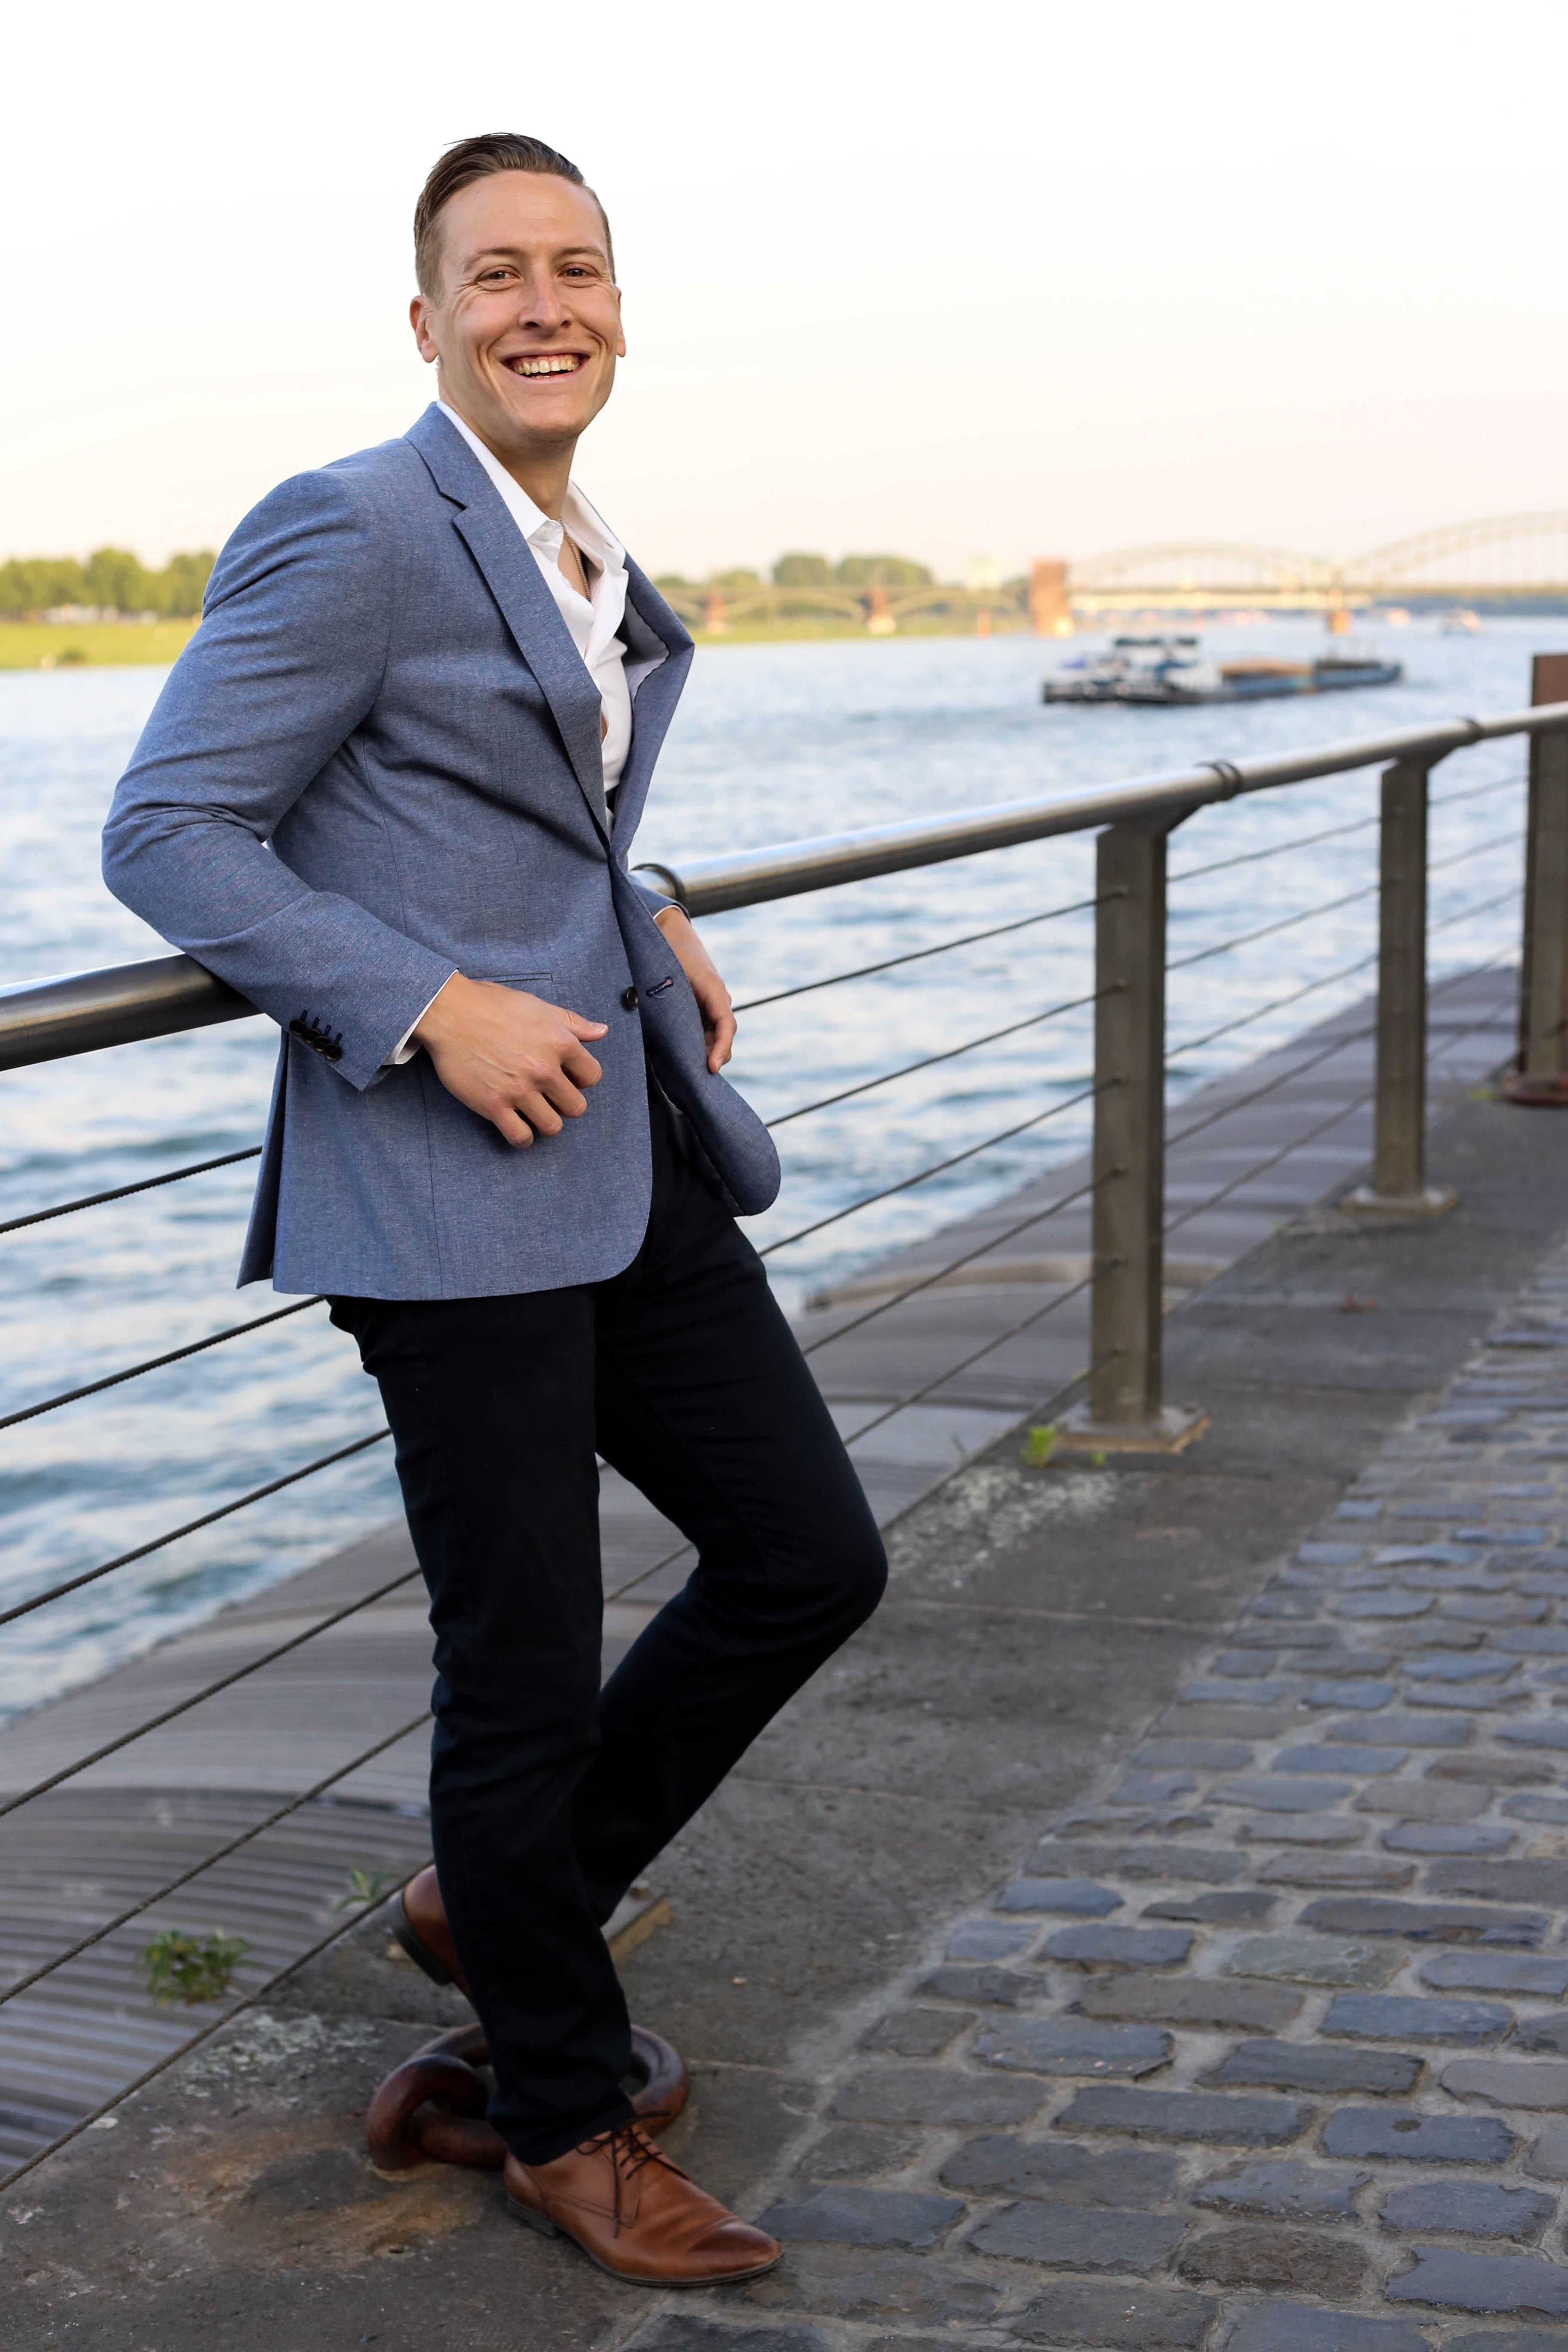 hellblaues-sakko-smart-casual-look-menfashion-fashionblog-berlin_7925